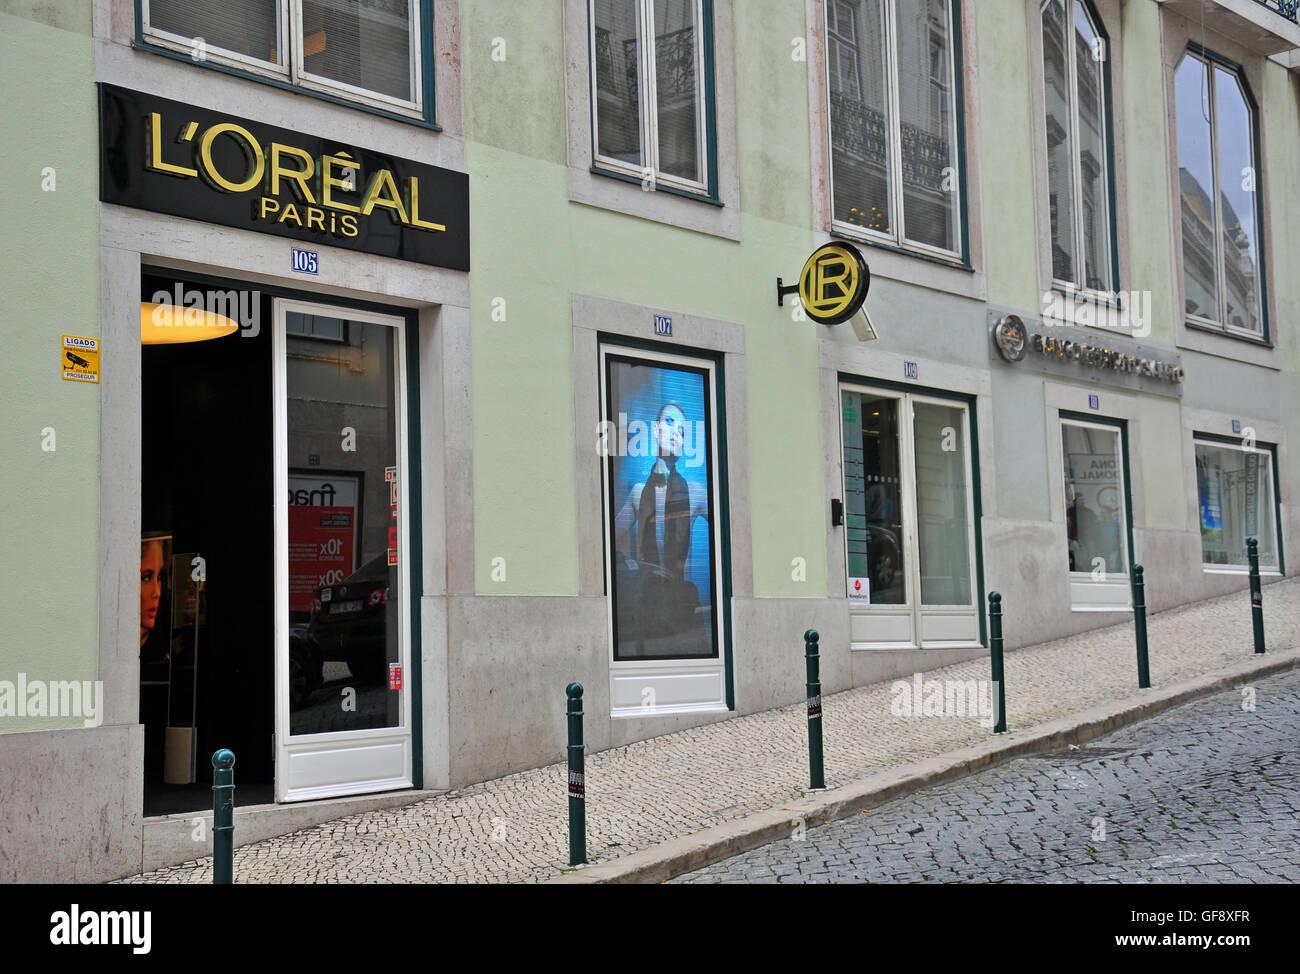 portugal boutique photos portugal boutique images alamy. Black Bedroom Furniture Sets. Home Design Ideas